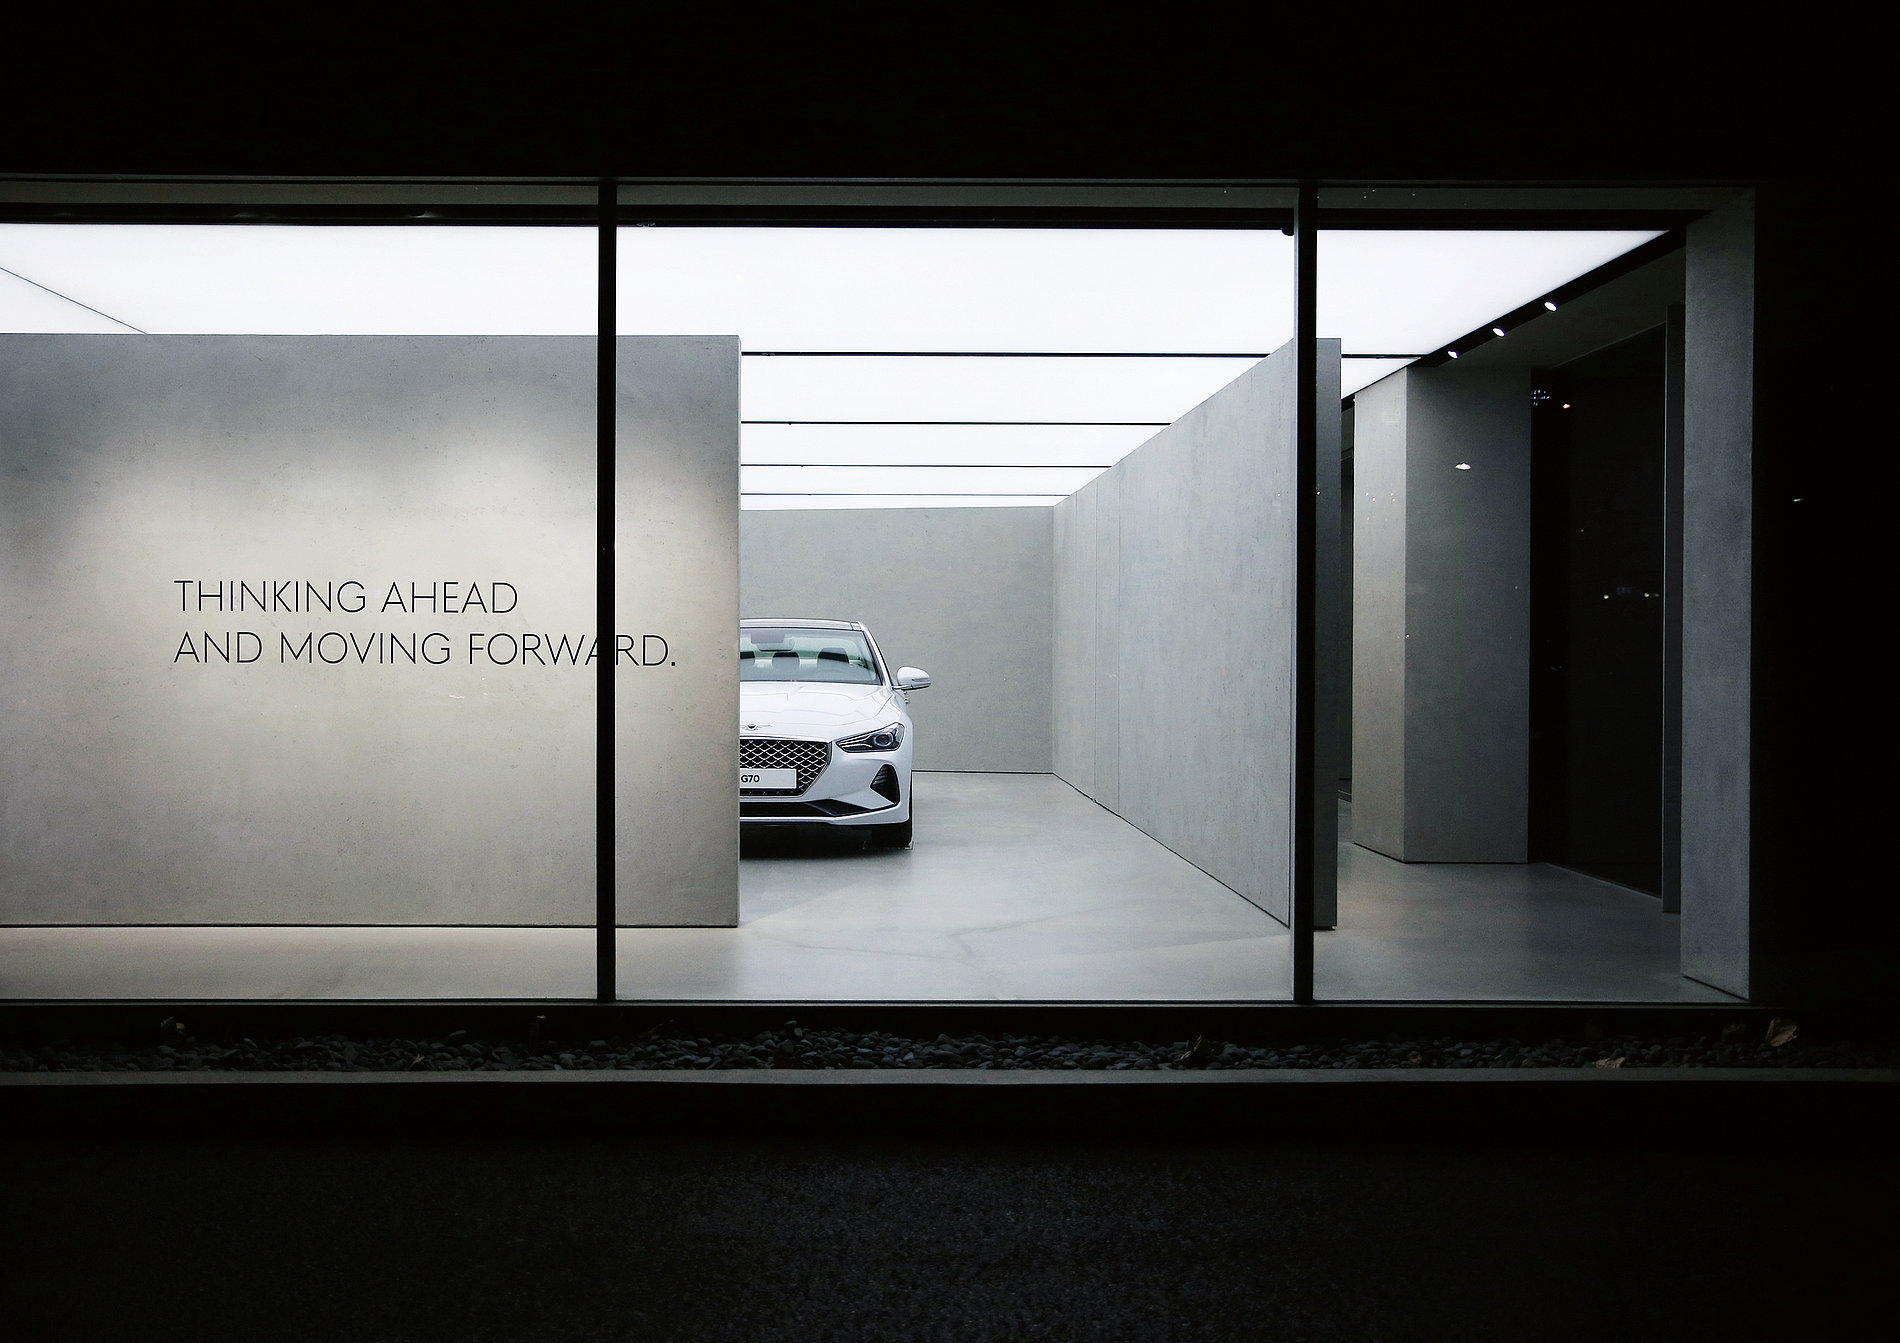 Genesis Gangnam Showroom | Red Dot Design Award